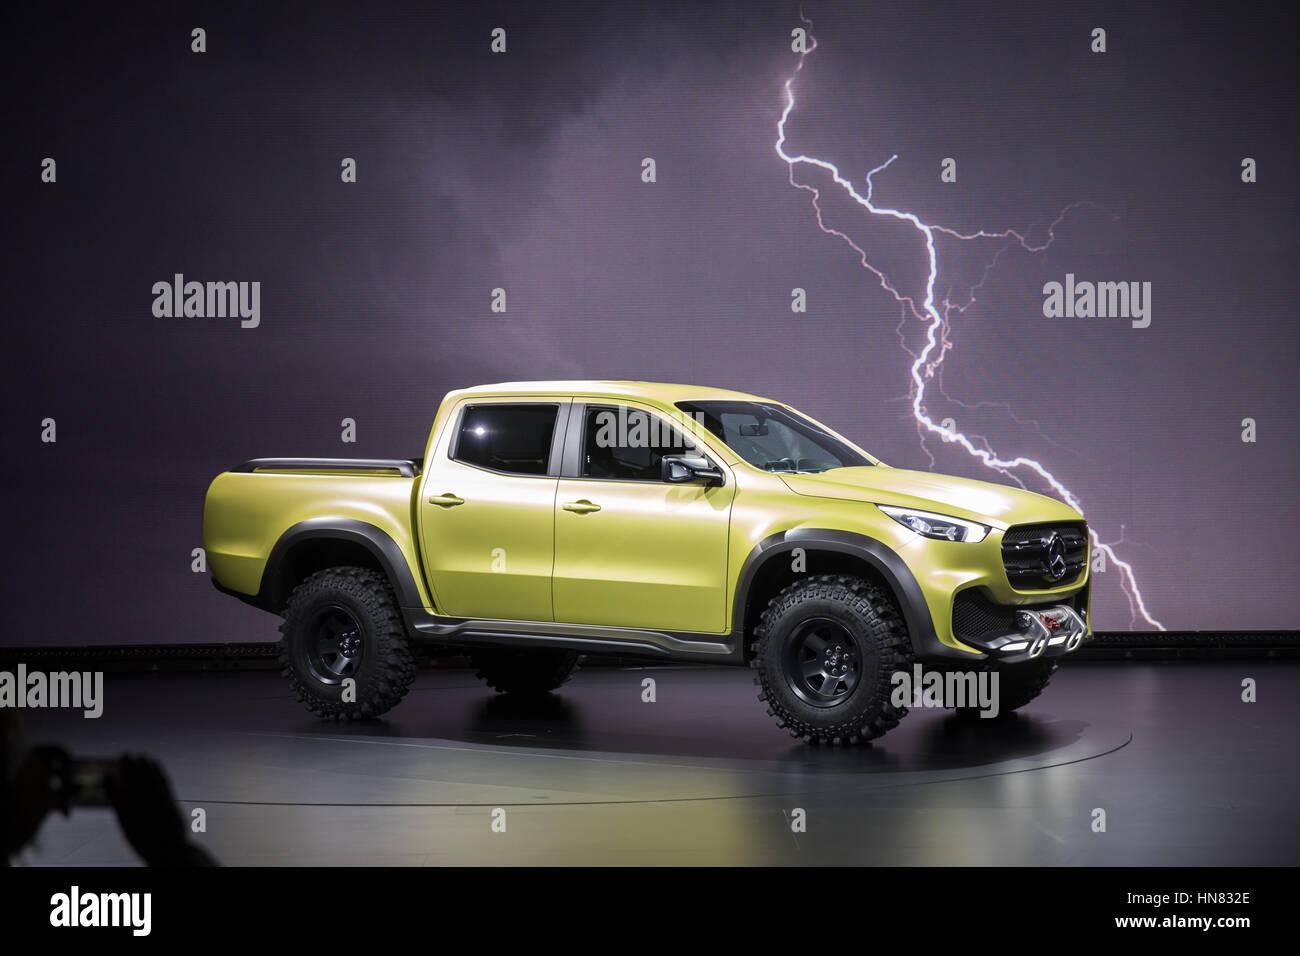 http://c8.alamy.com/comp/HN832E/a-concept-vehicle-type-mercedes-benz-concept-x-class-of-the-automobile-HN832E.jpg